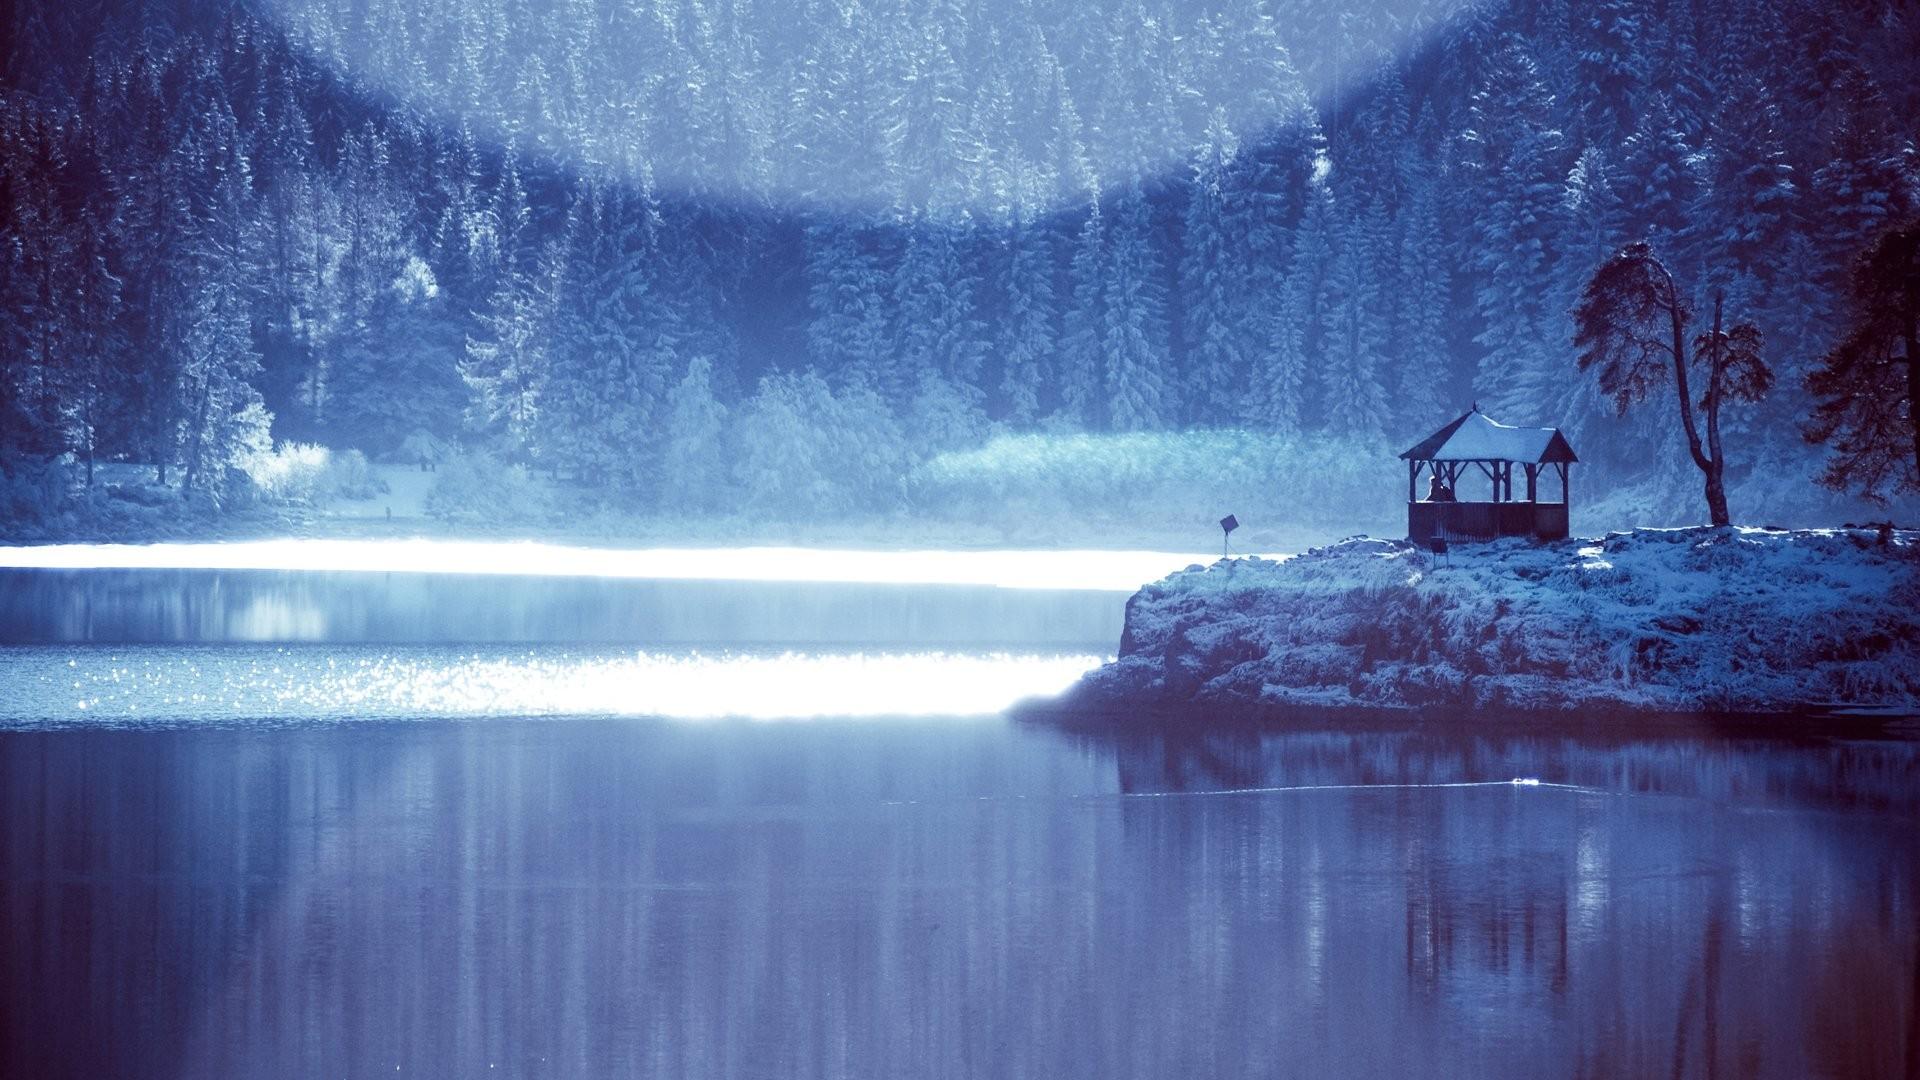 scenic winter beautiful wallpapers - photo #6